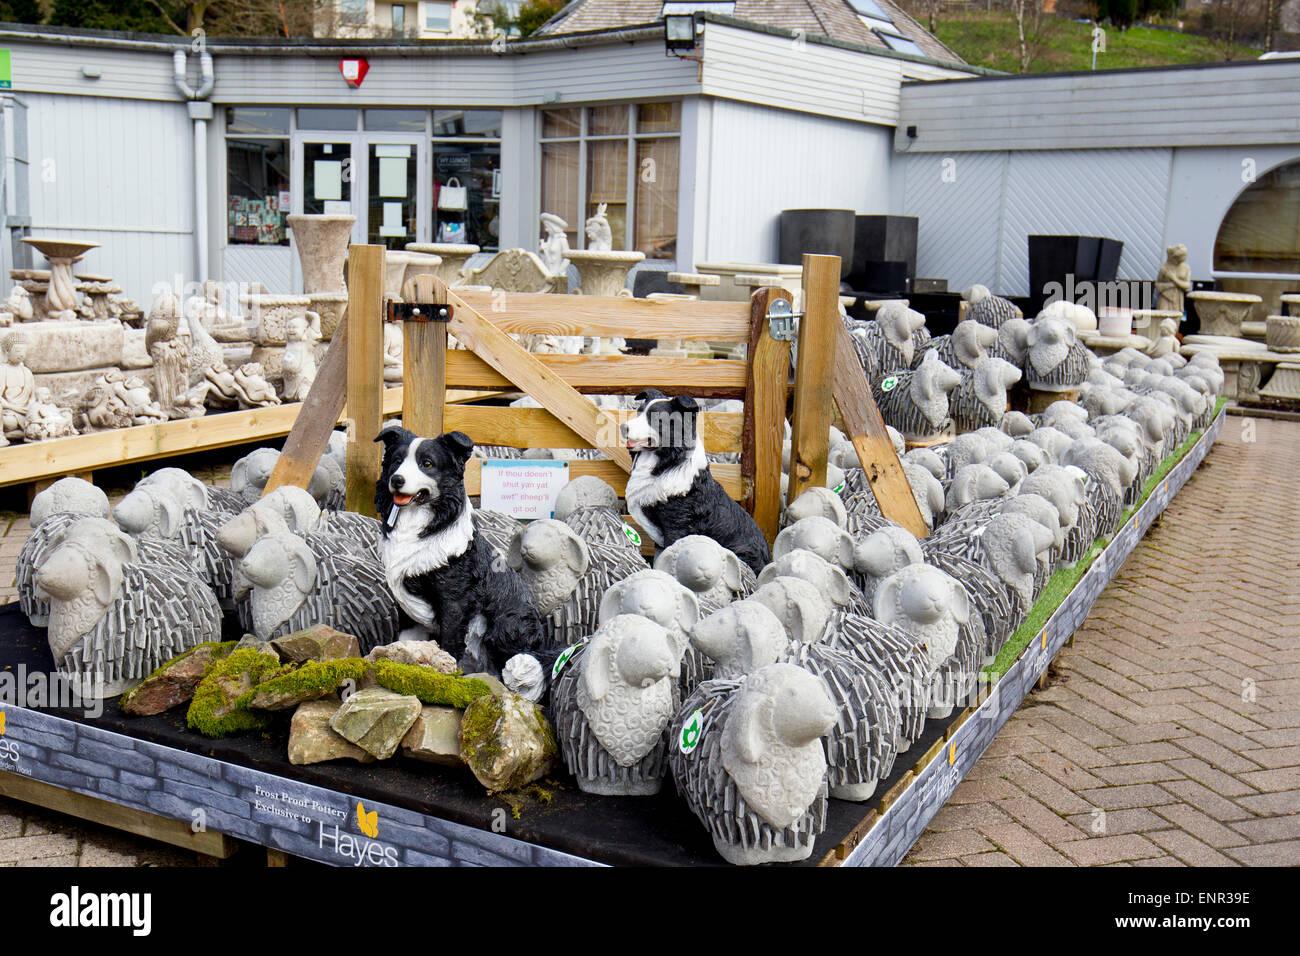 Ornaments for garden - Hayes Garden World Centre Ambleside Cumbria Lake District Slate Made Sheep Garden Ornaments